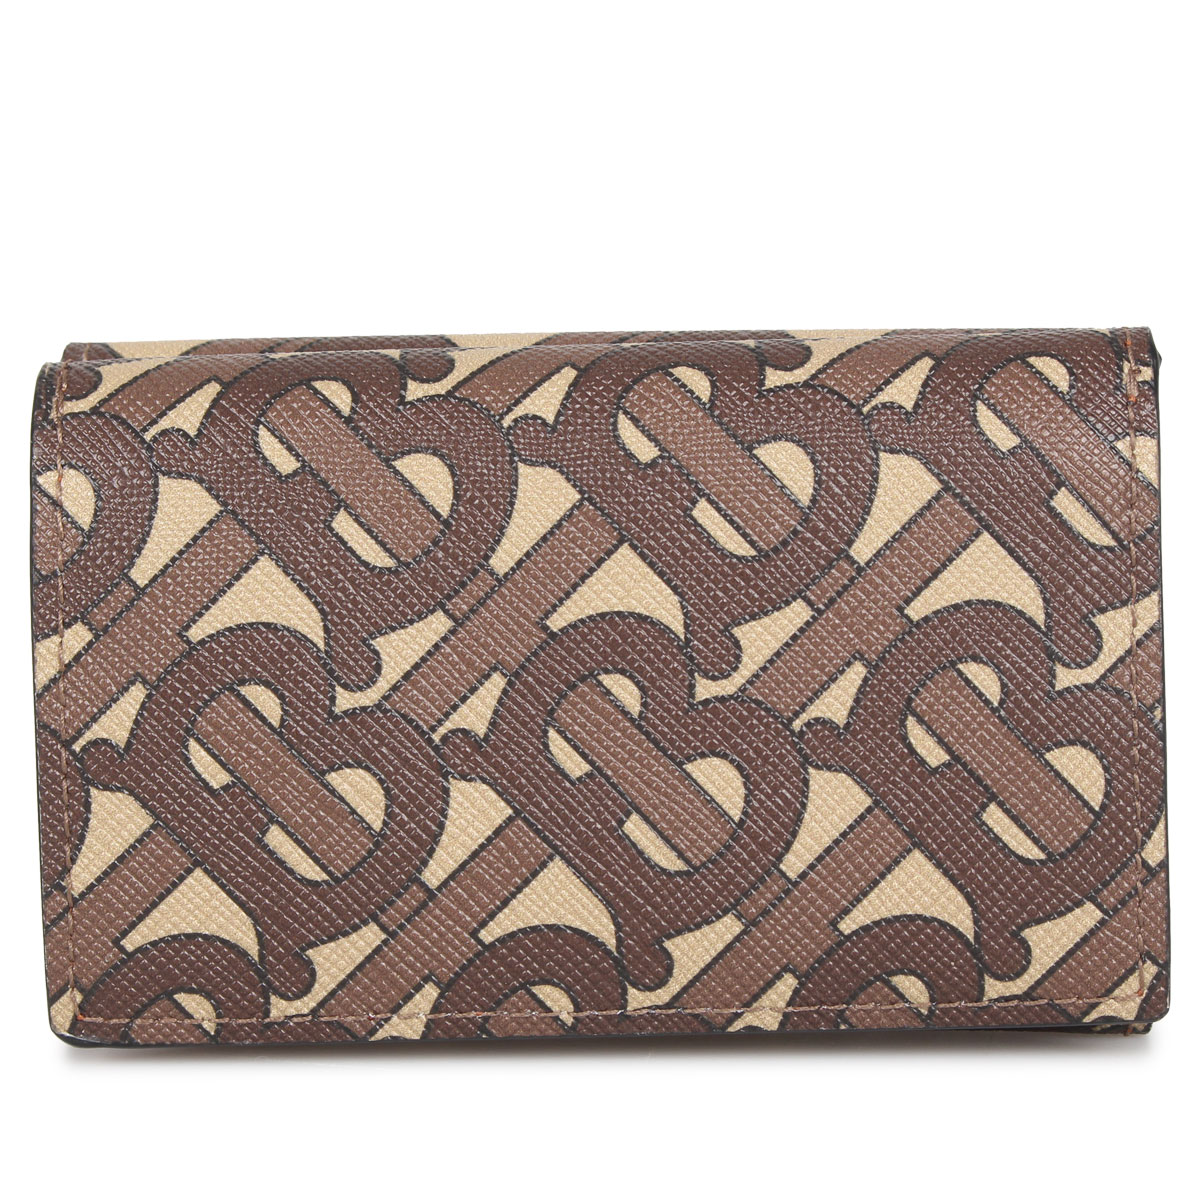 BURBERRY TRI-FOLD WALLET バーバリー 財布 三つ折り メンズ ブラウン 8022945